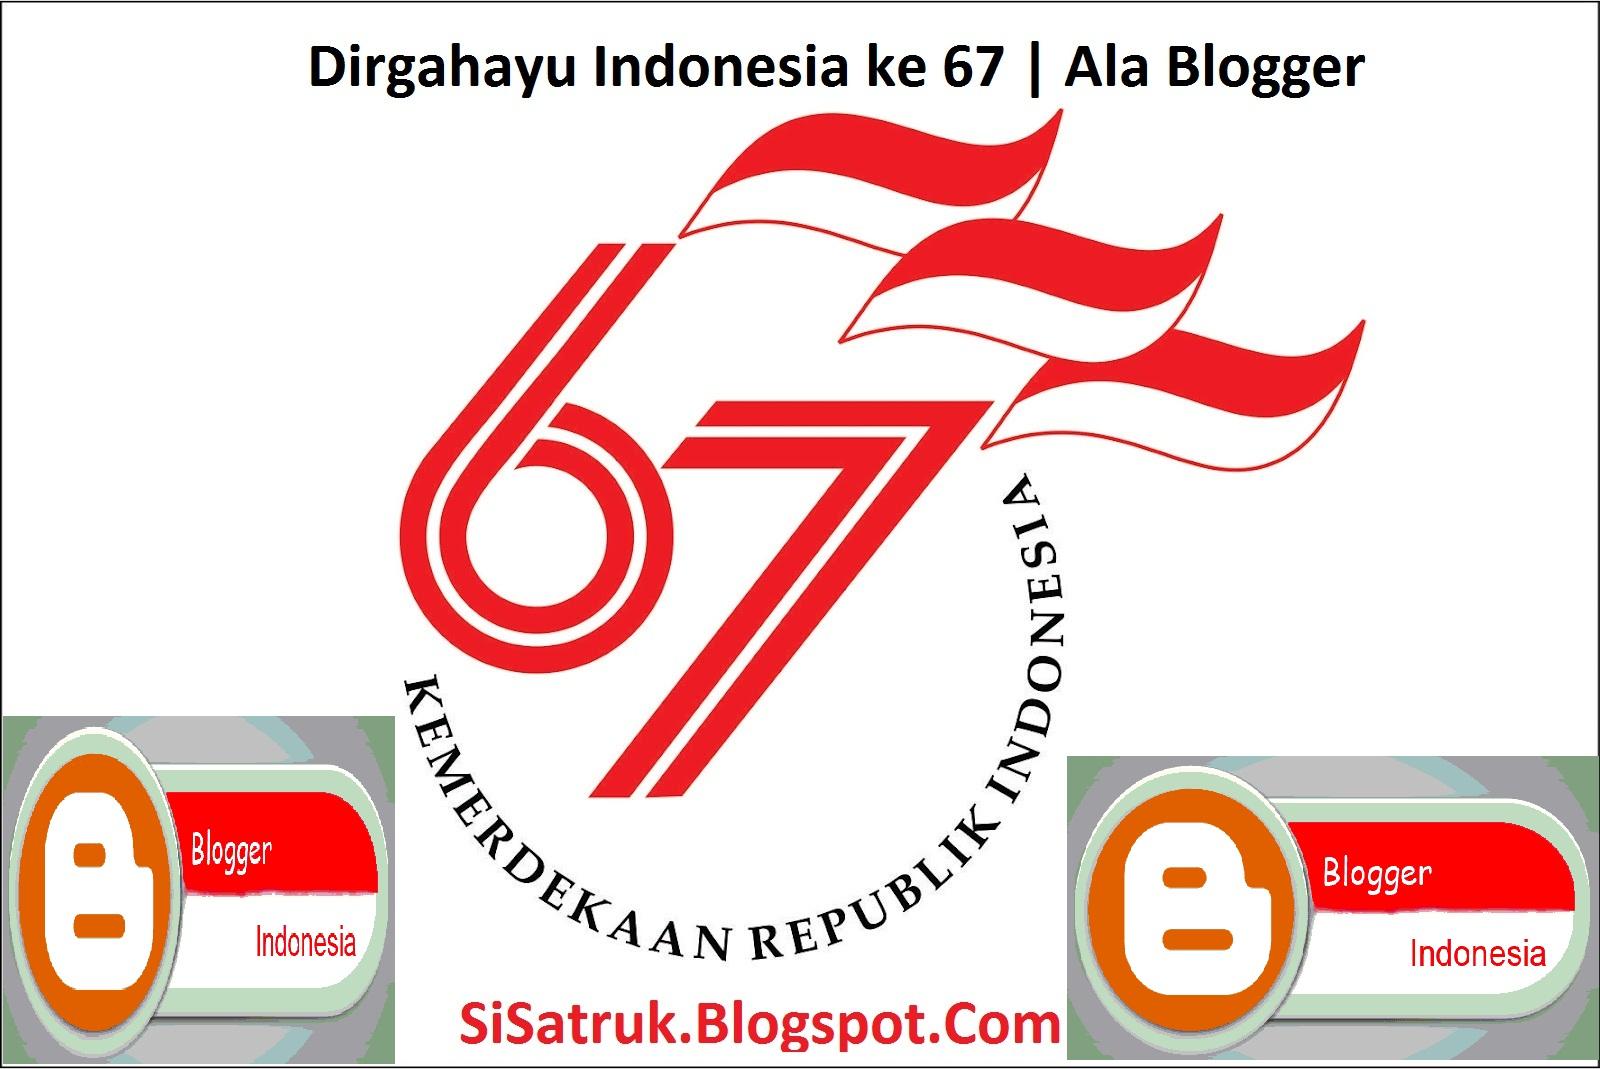 Dirgahayu Indonesia ke 67 | Ala Blogger